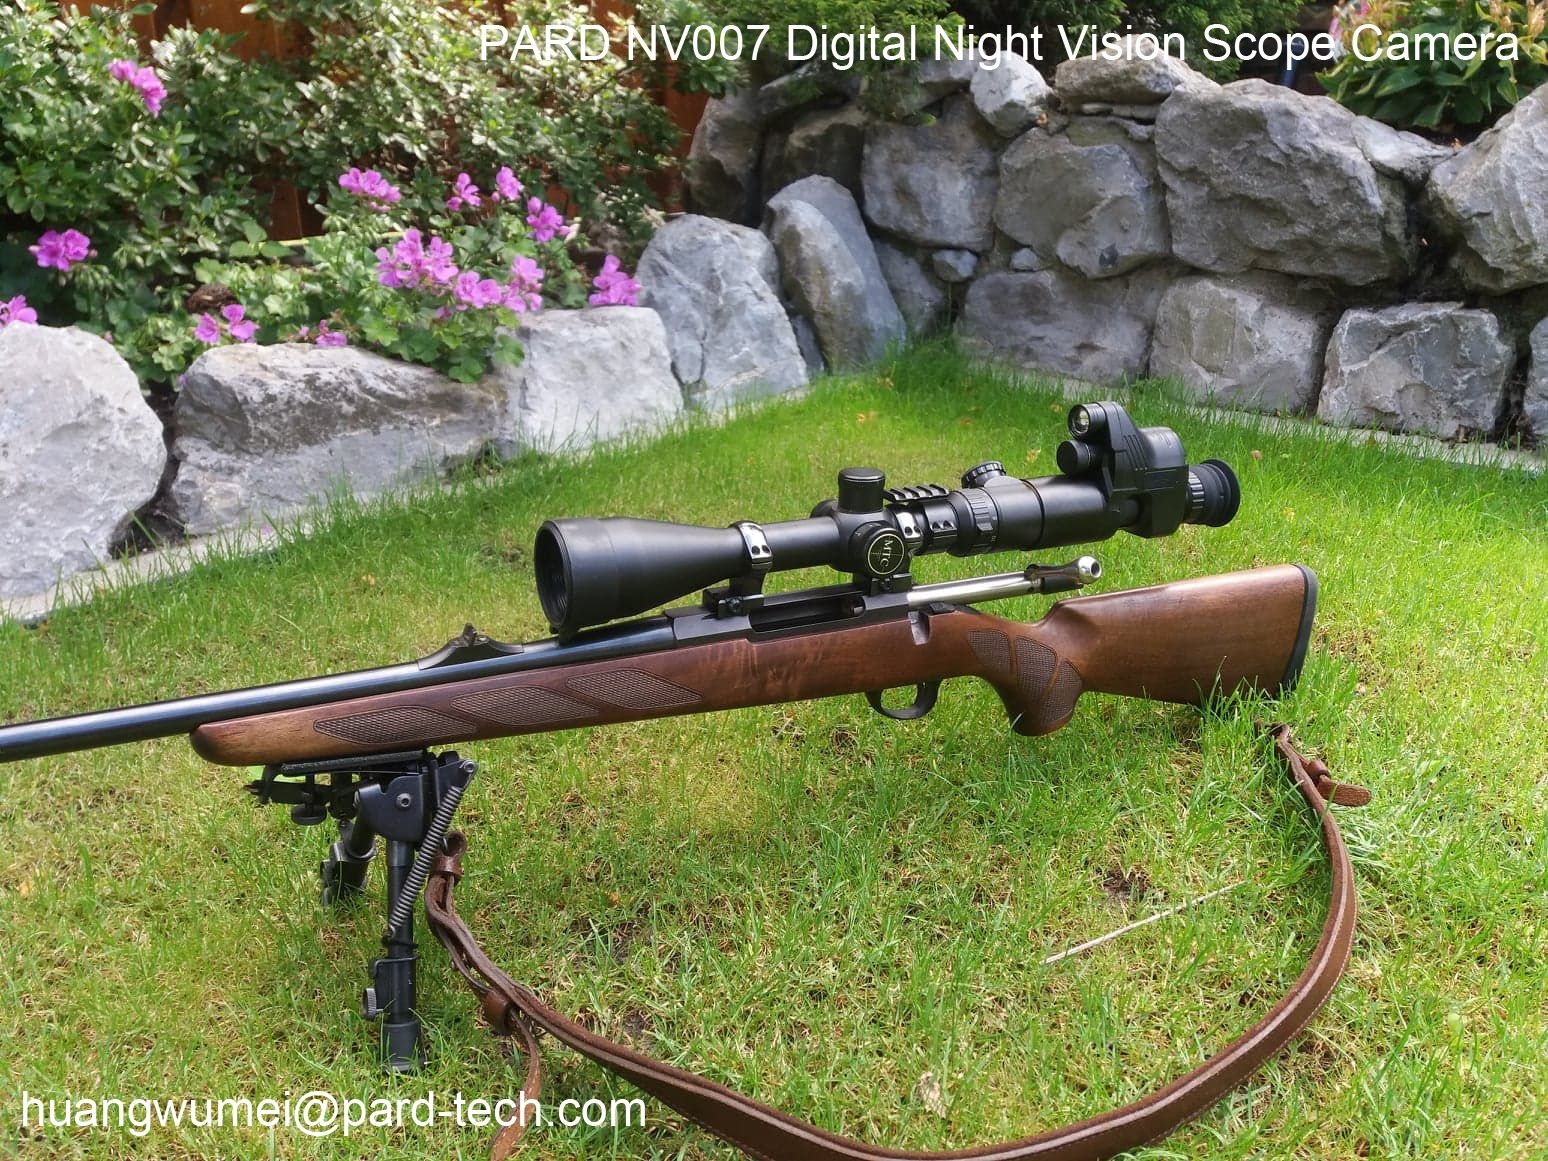 PARD NV007 Night Vision Rifle Scope Camera | PARD Thermal